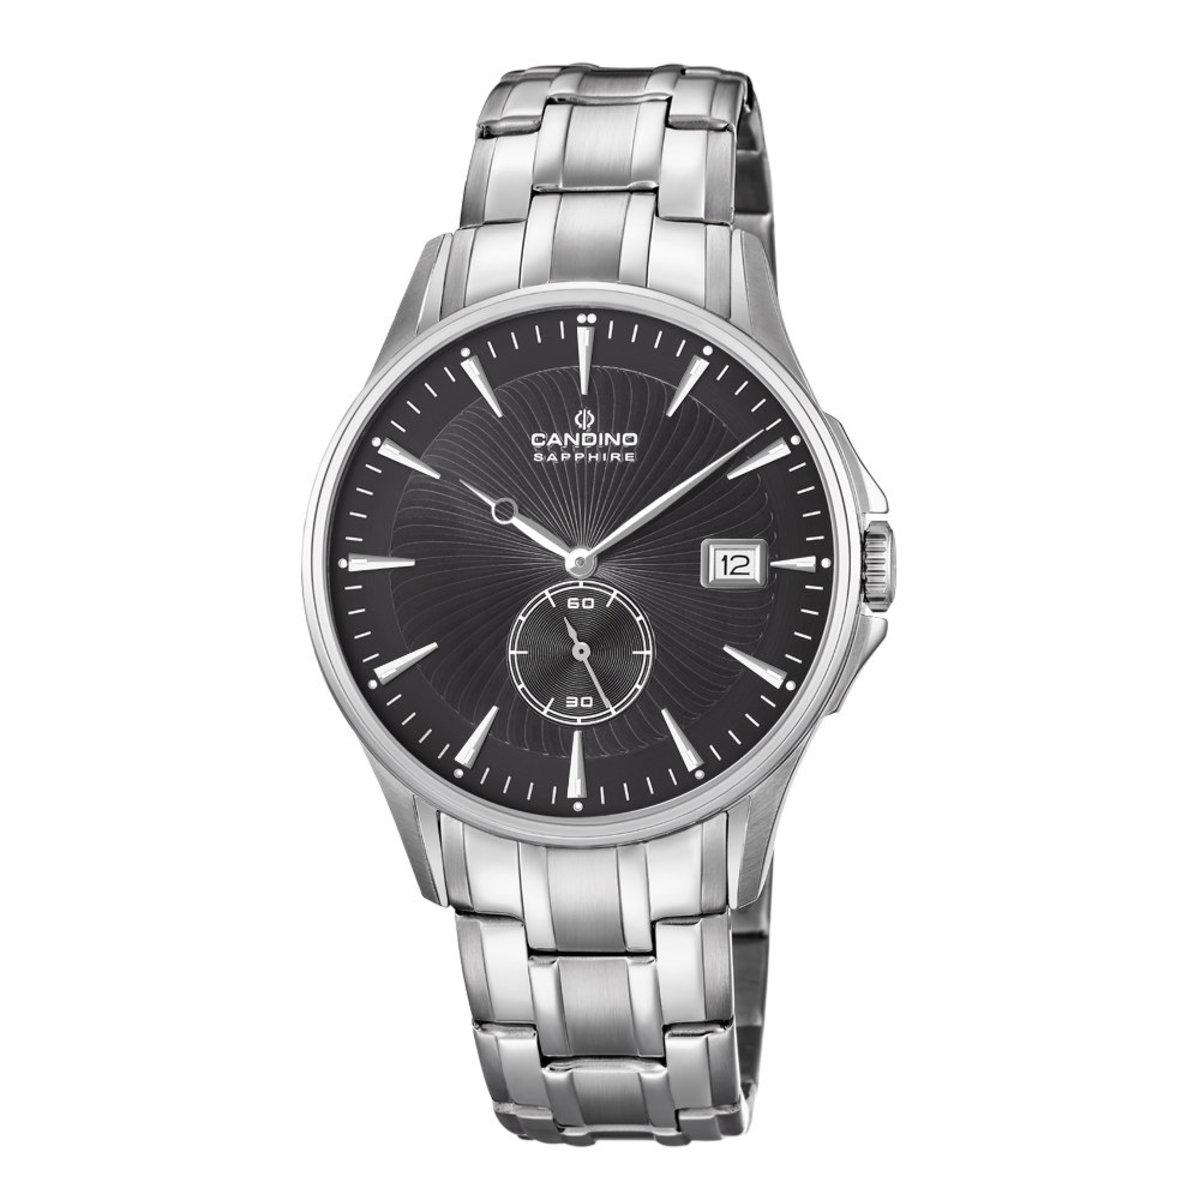 Candino Male Quartz Watch C4635_4